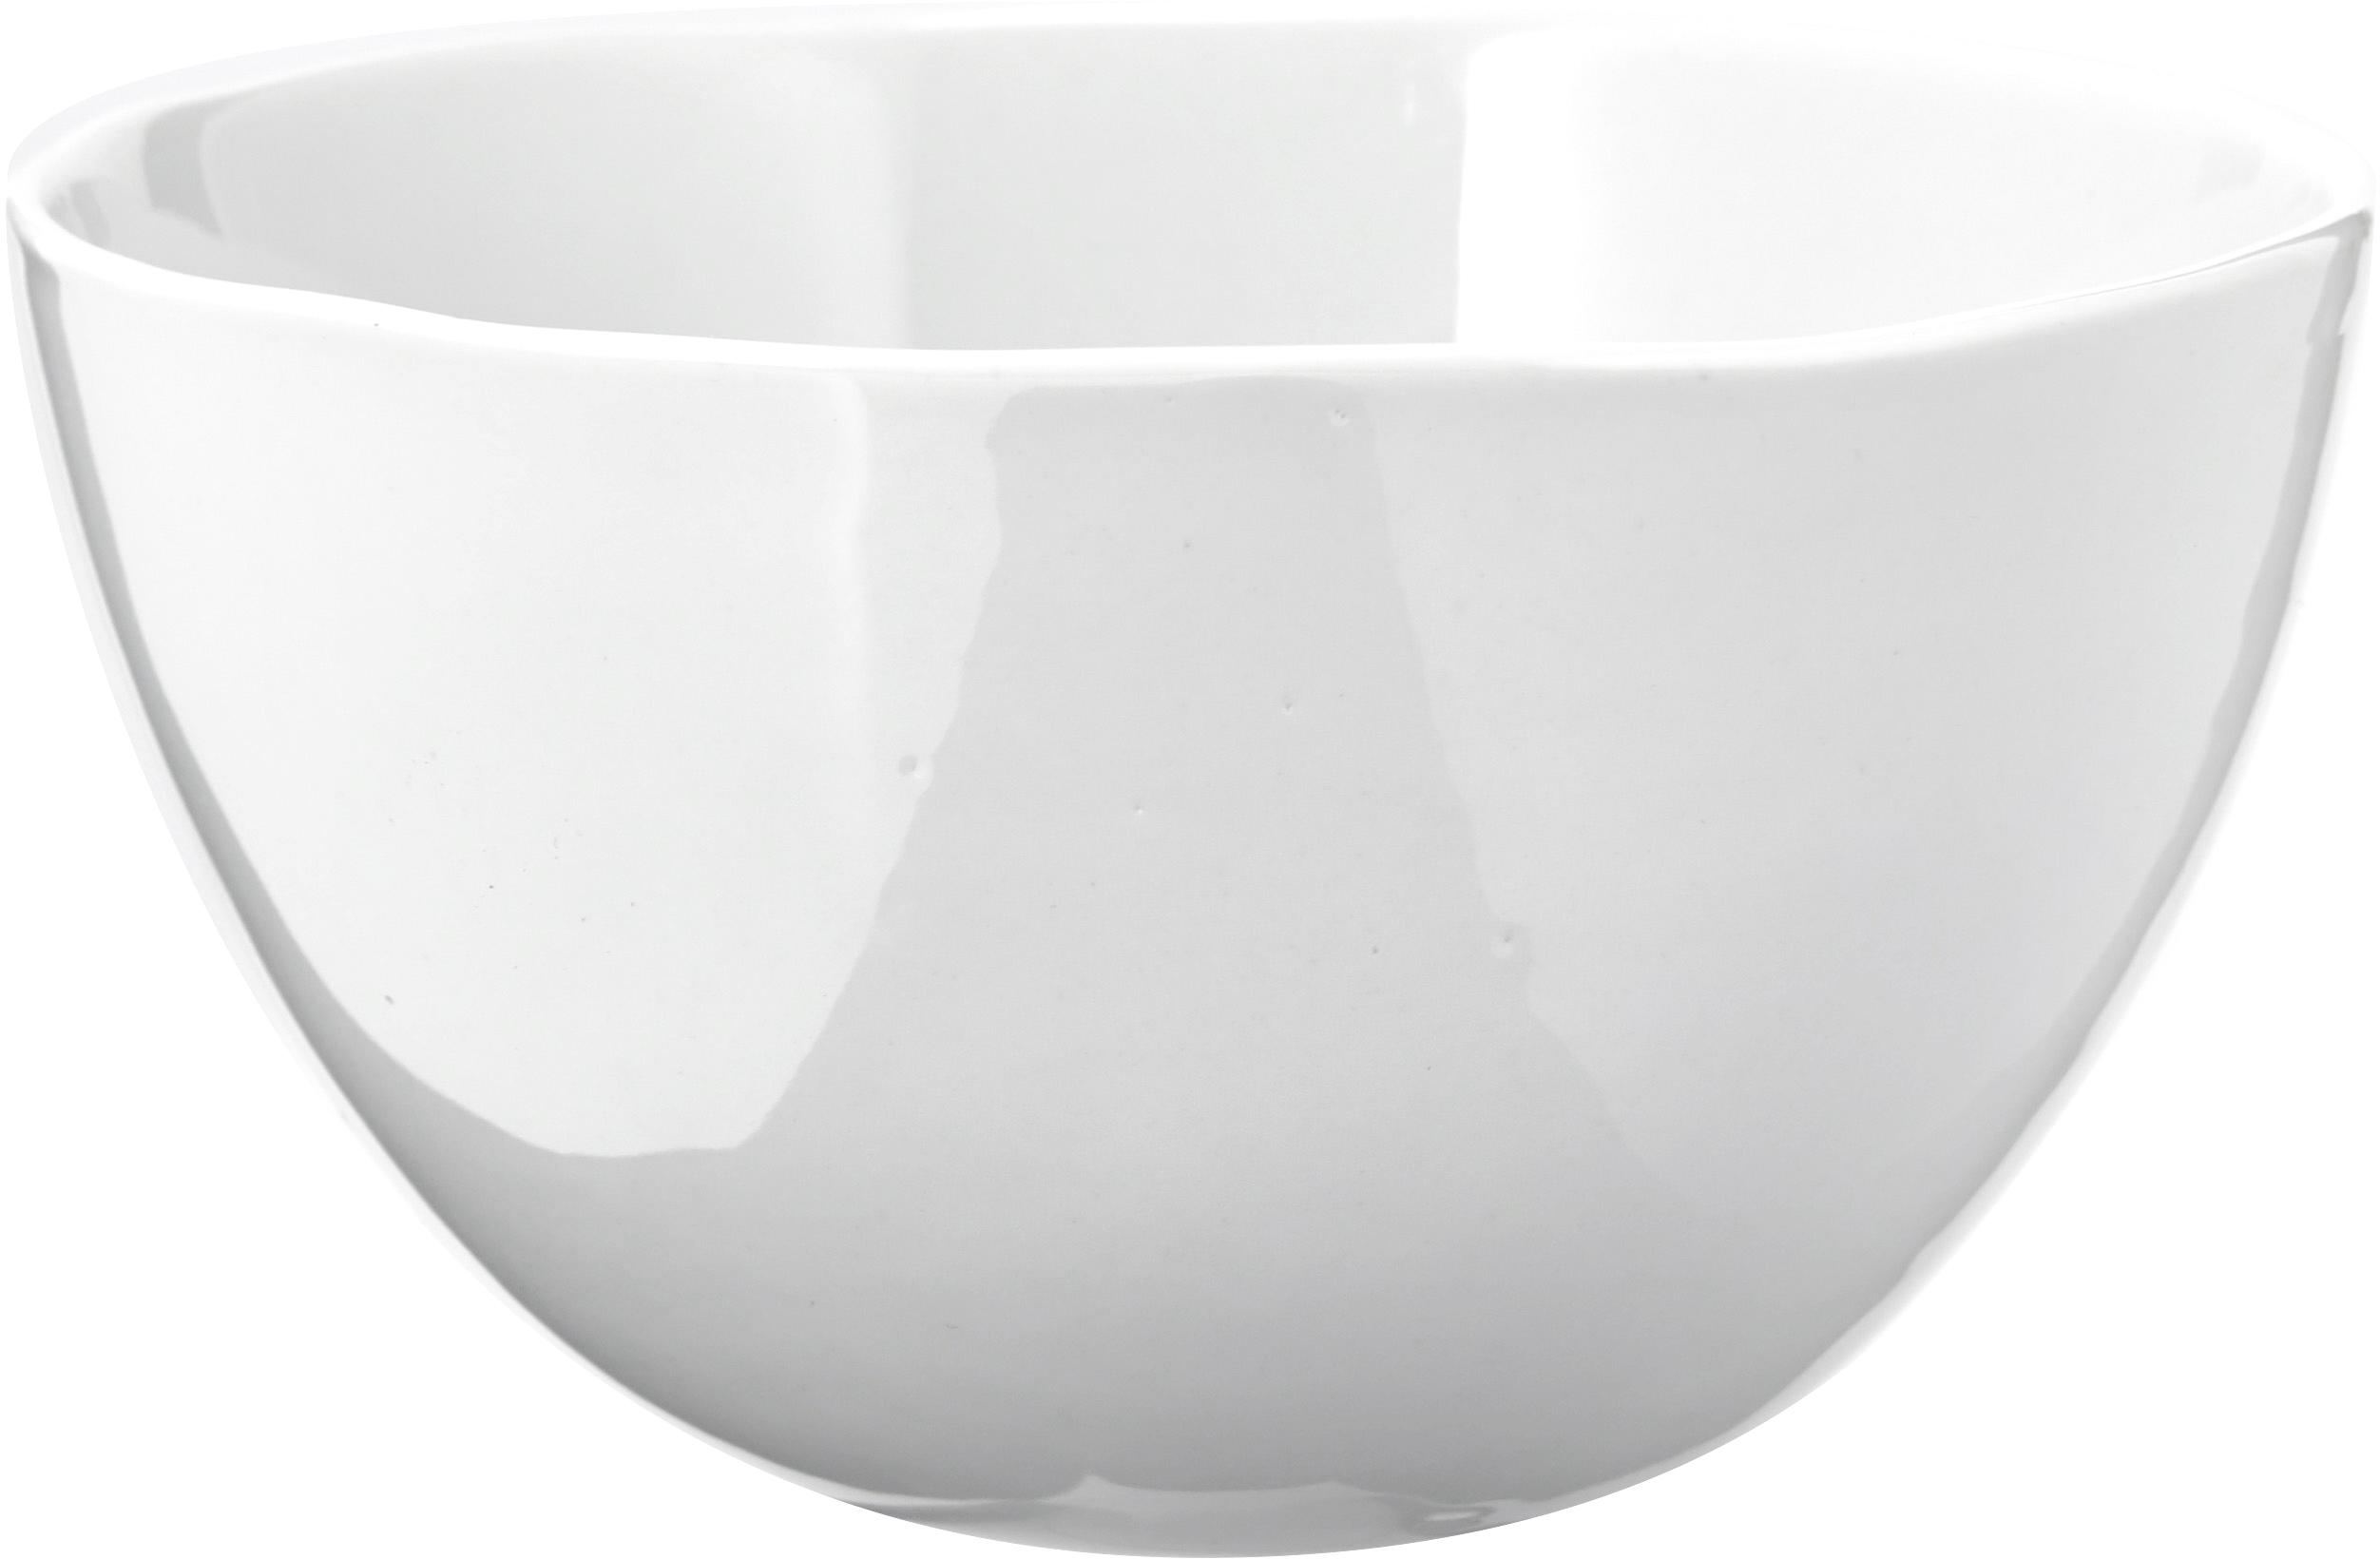 Ciotola Porcelino con superficie irregolare 6 pz, Porcellana, volutamente irregolare, Bianco, Ø 15 x Alt. 8 cm